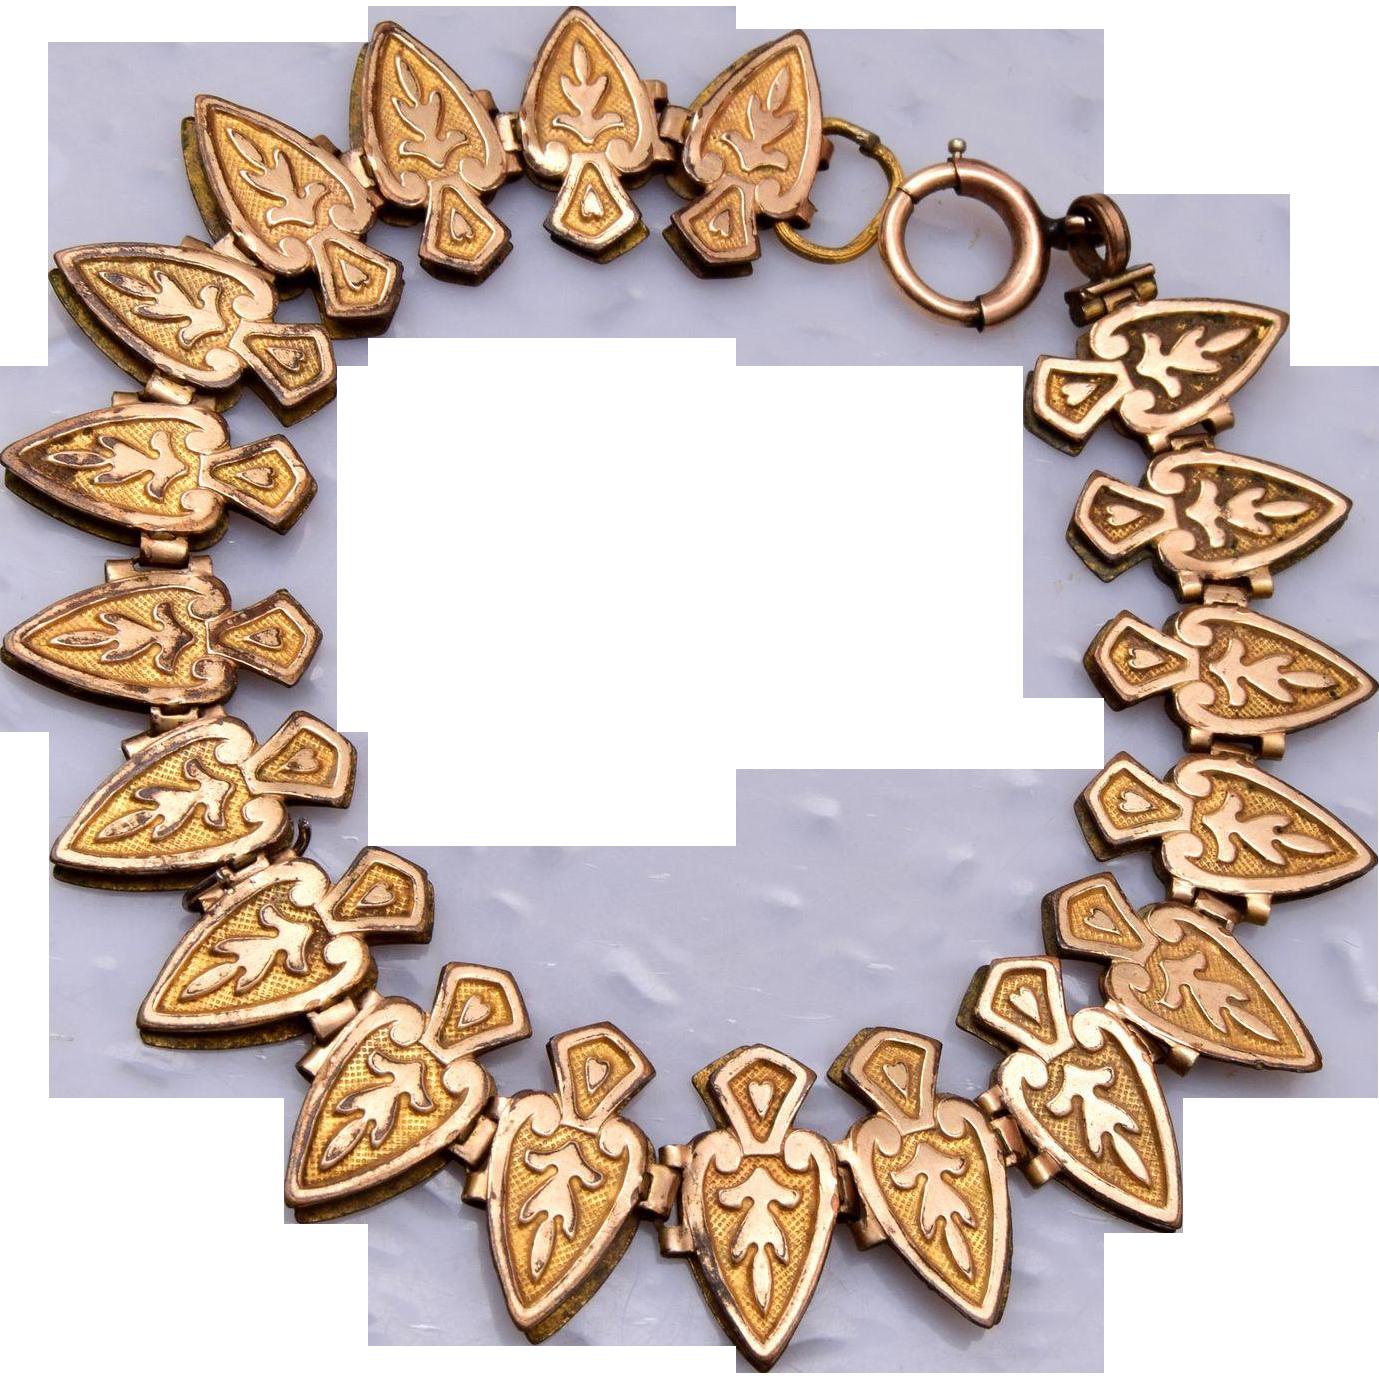 Gold Filled Book Chain Bracelet